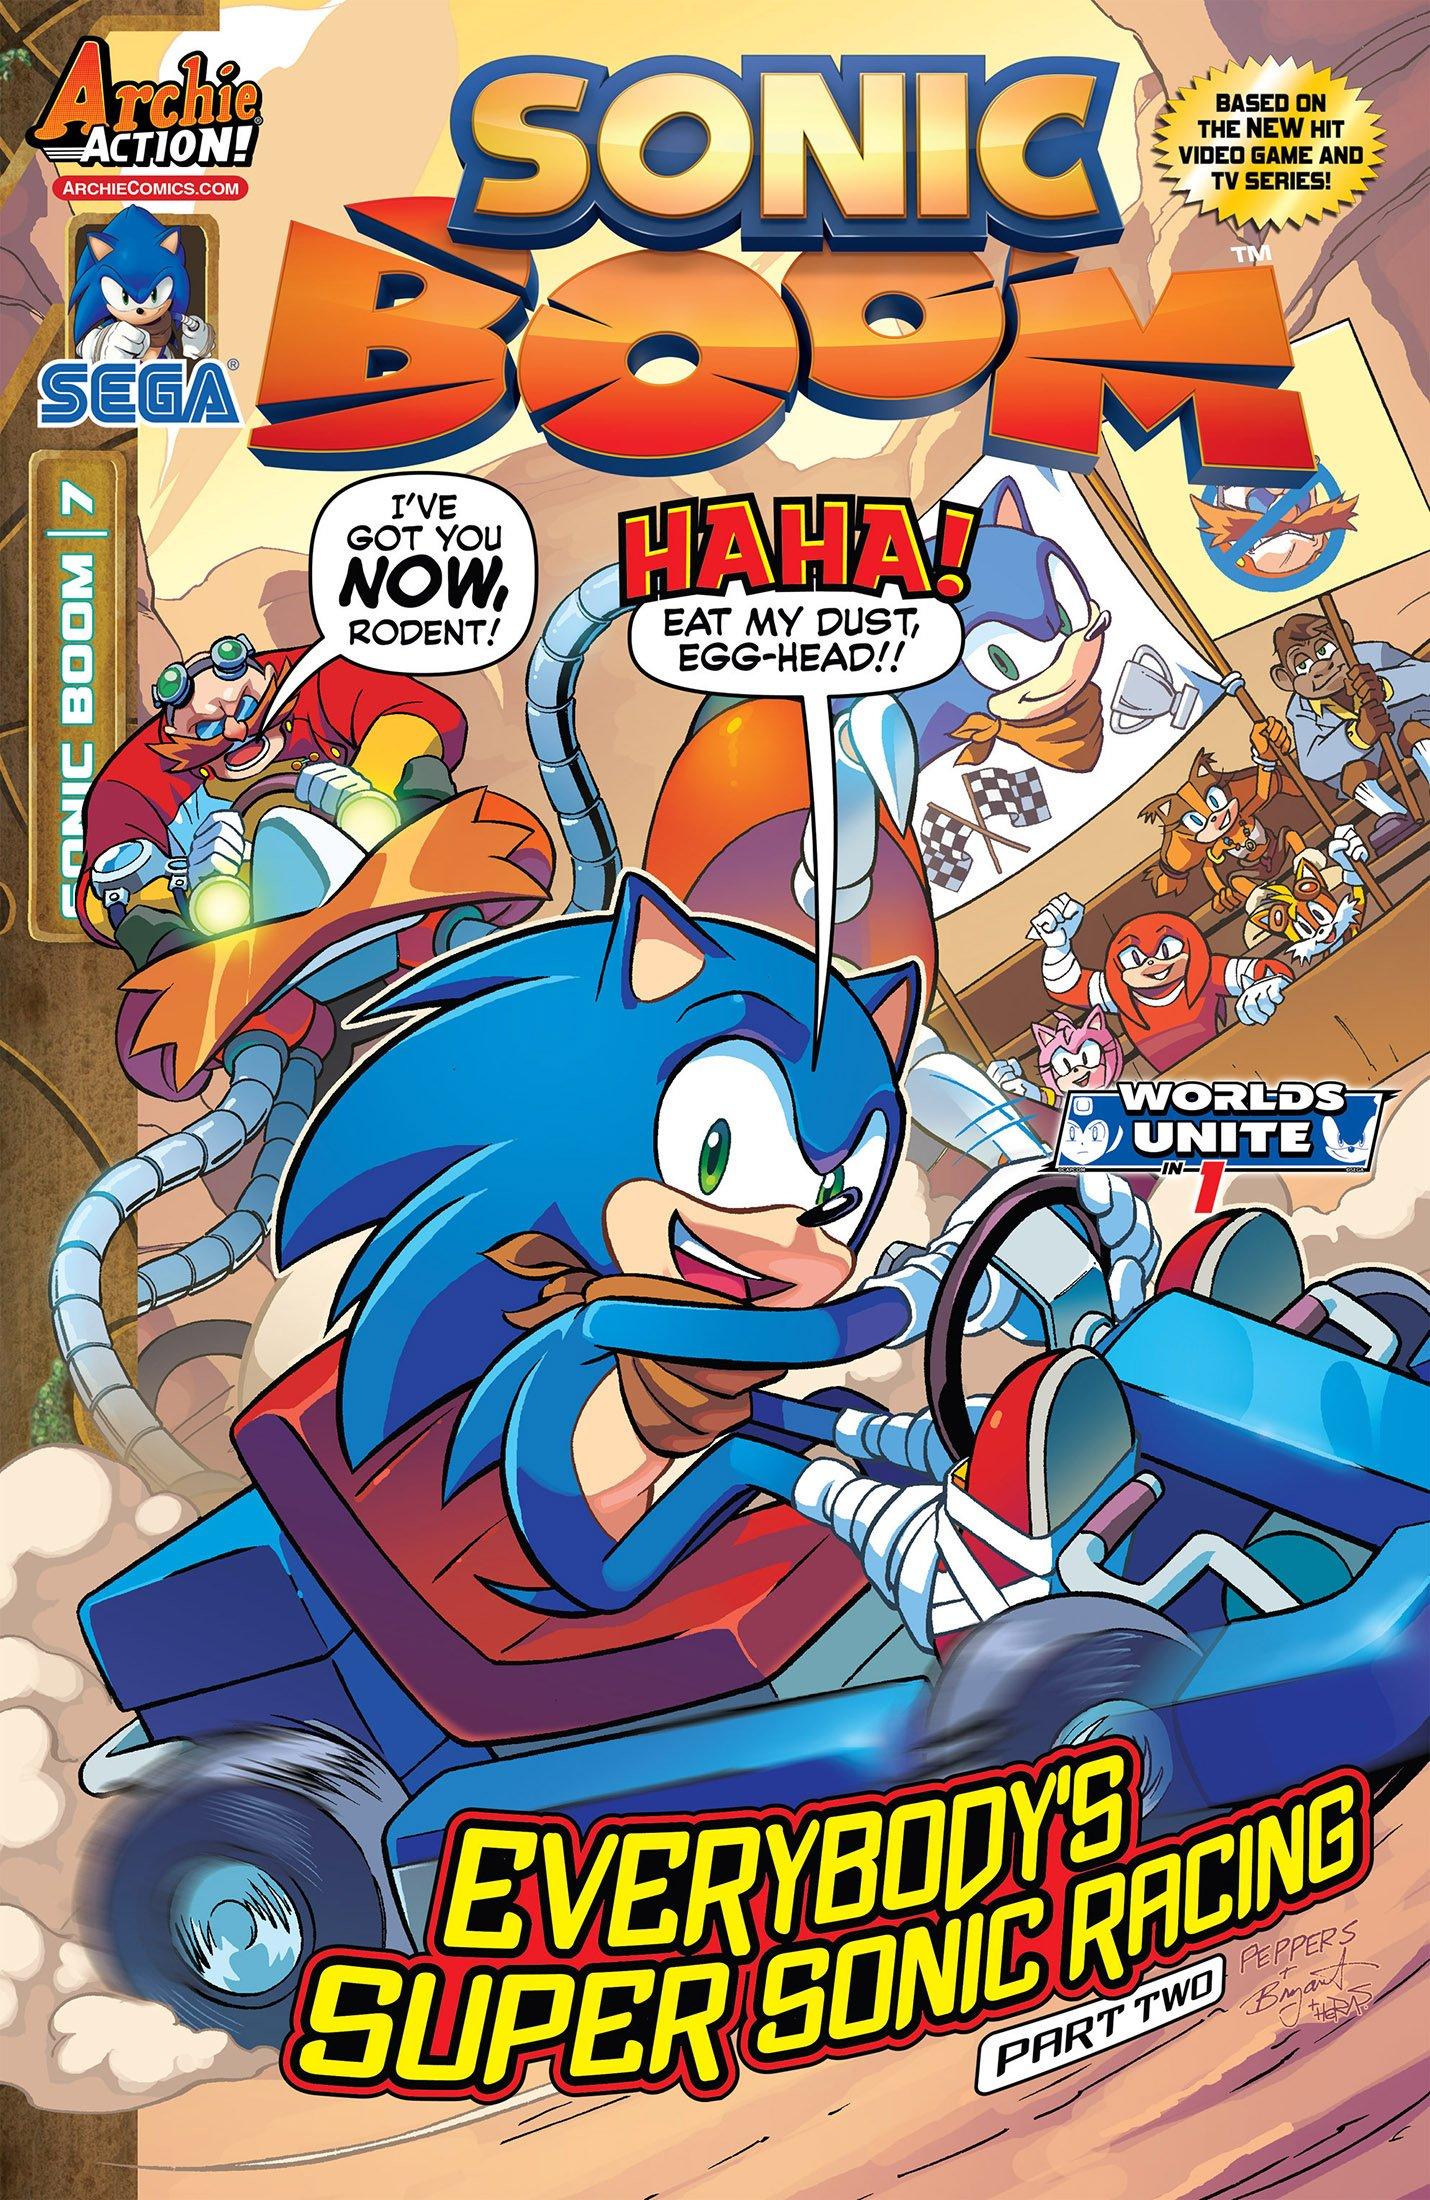 Sonic Boom 007 (June 2015)